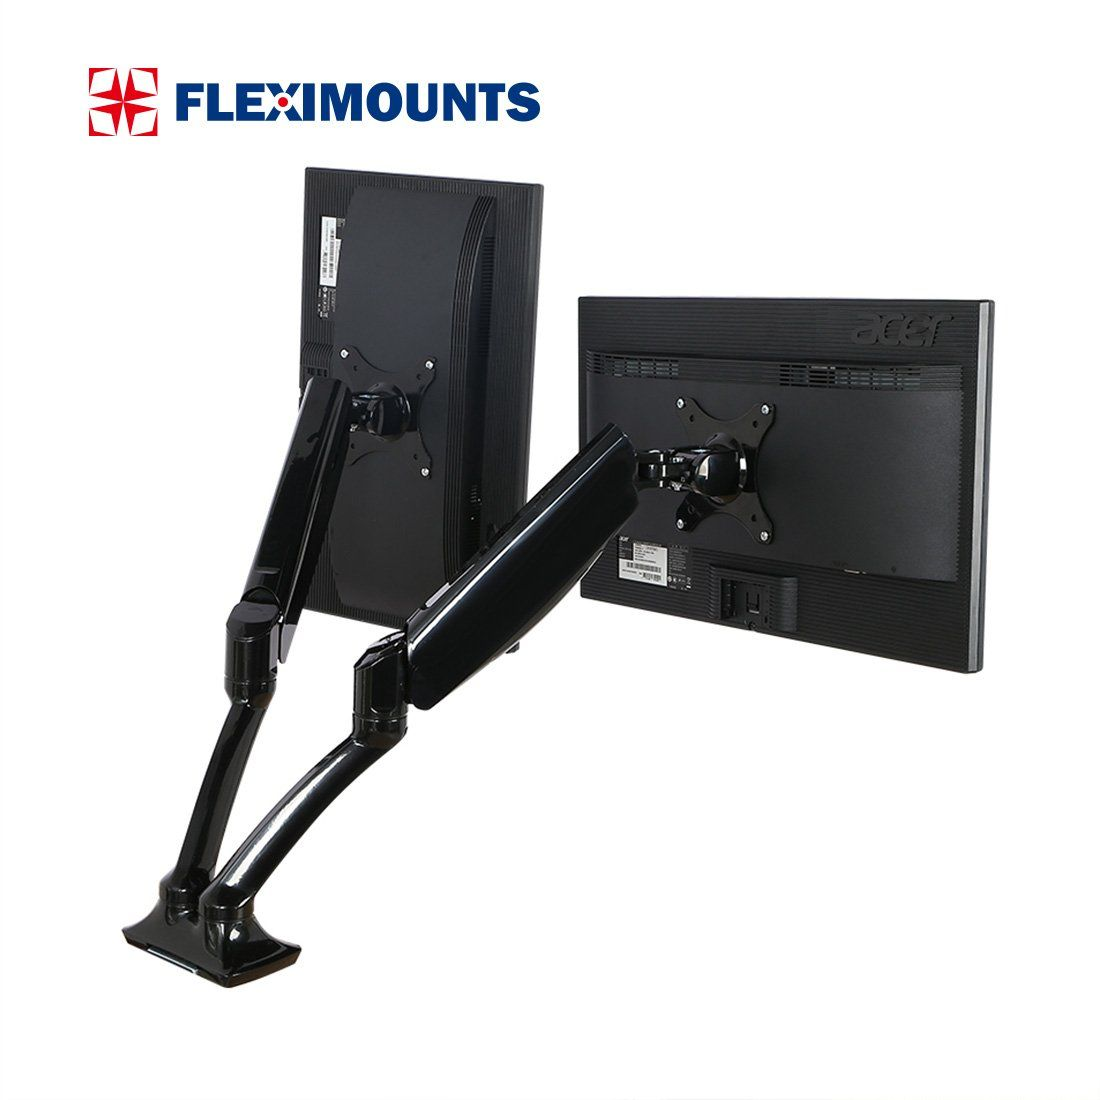 Fleximounts Dual Monitor Mount Lcd Arm Full Motion Desk Mounts For